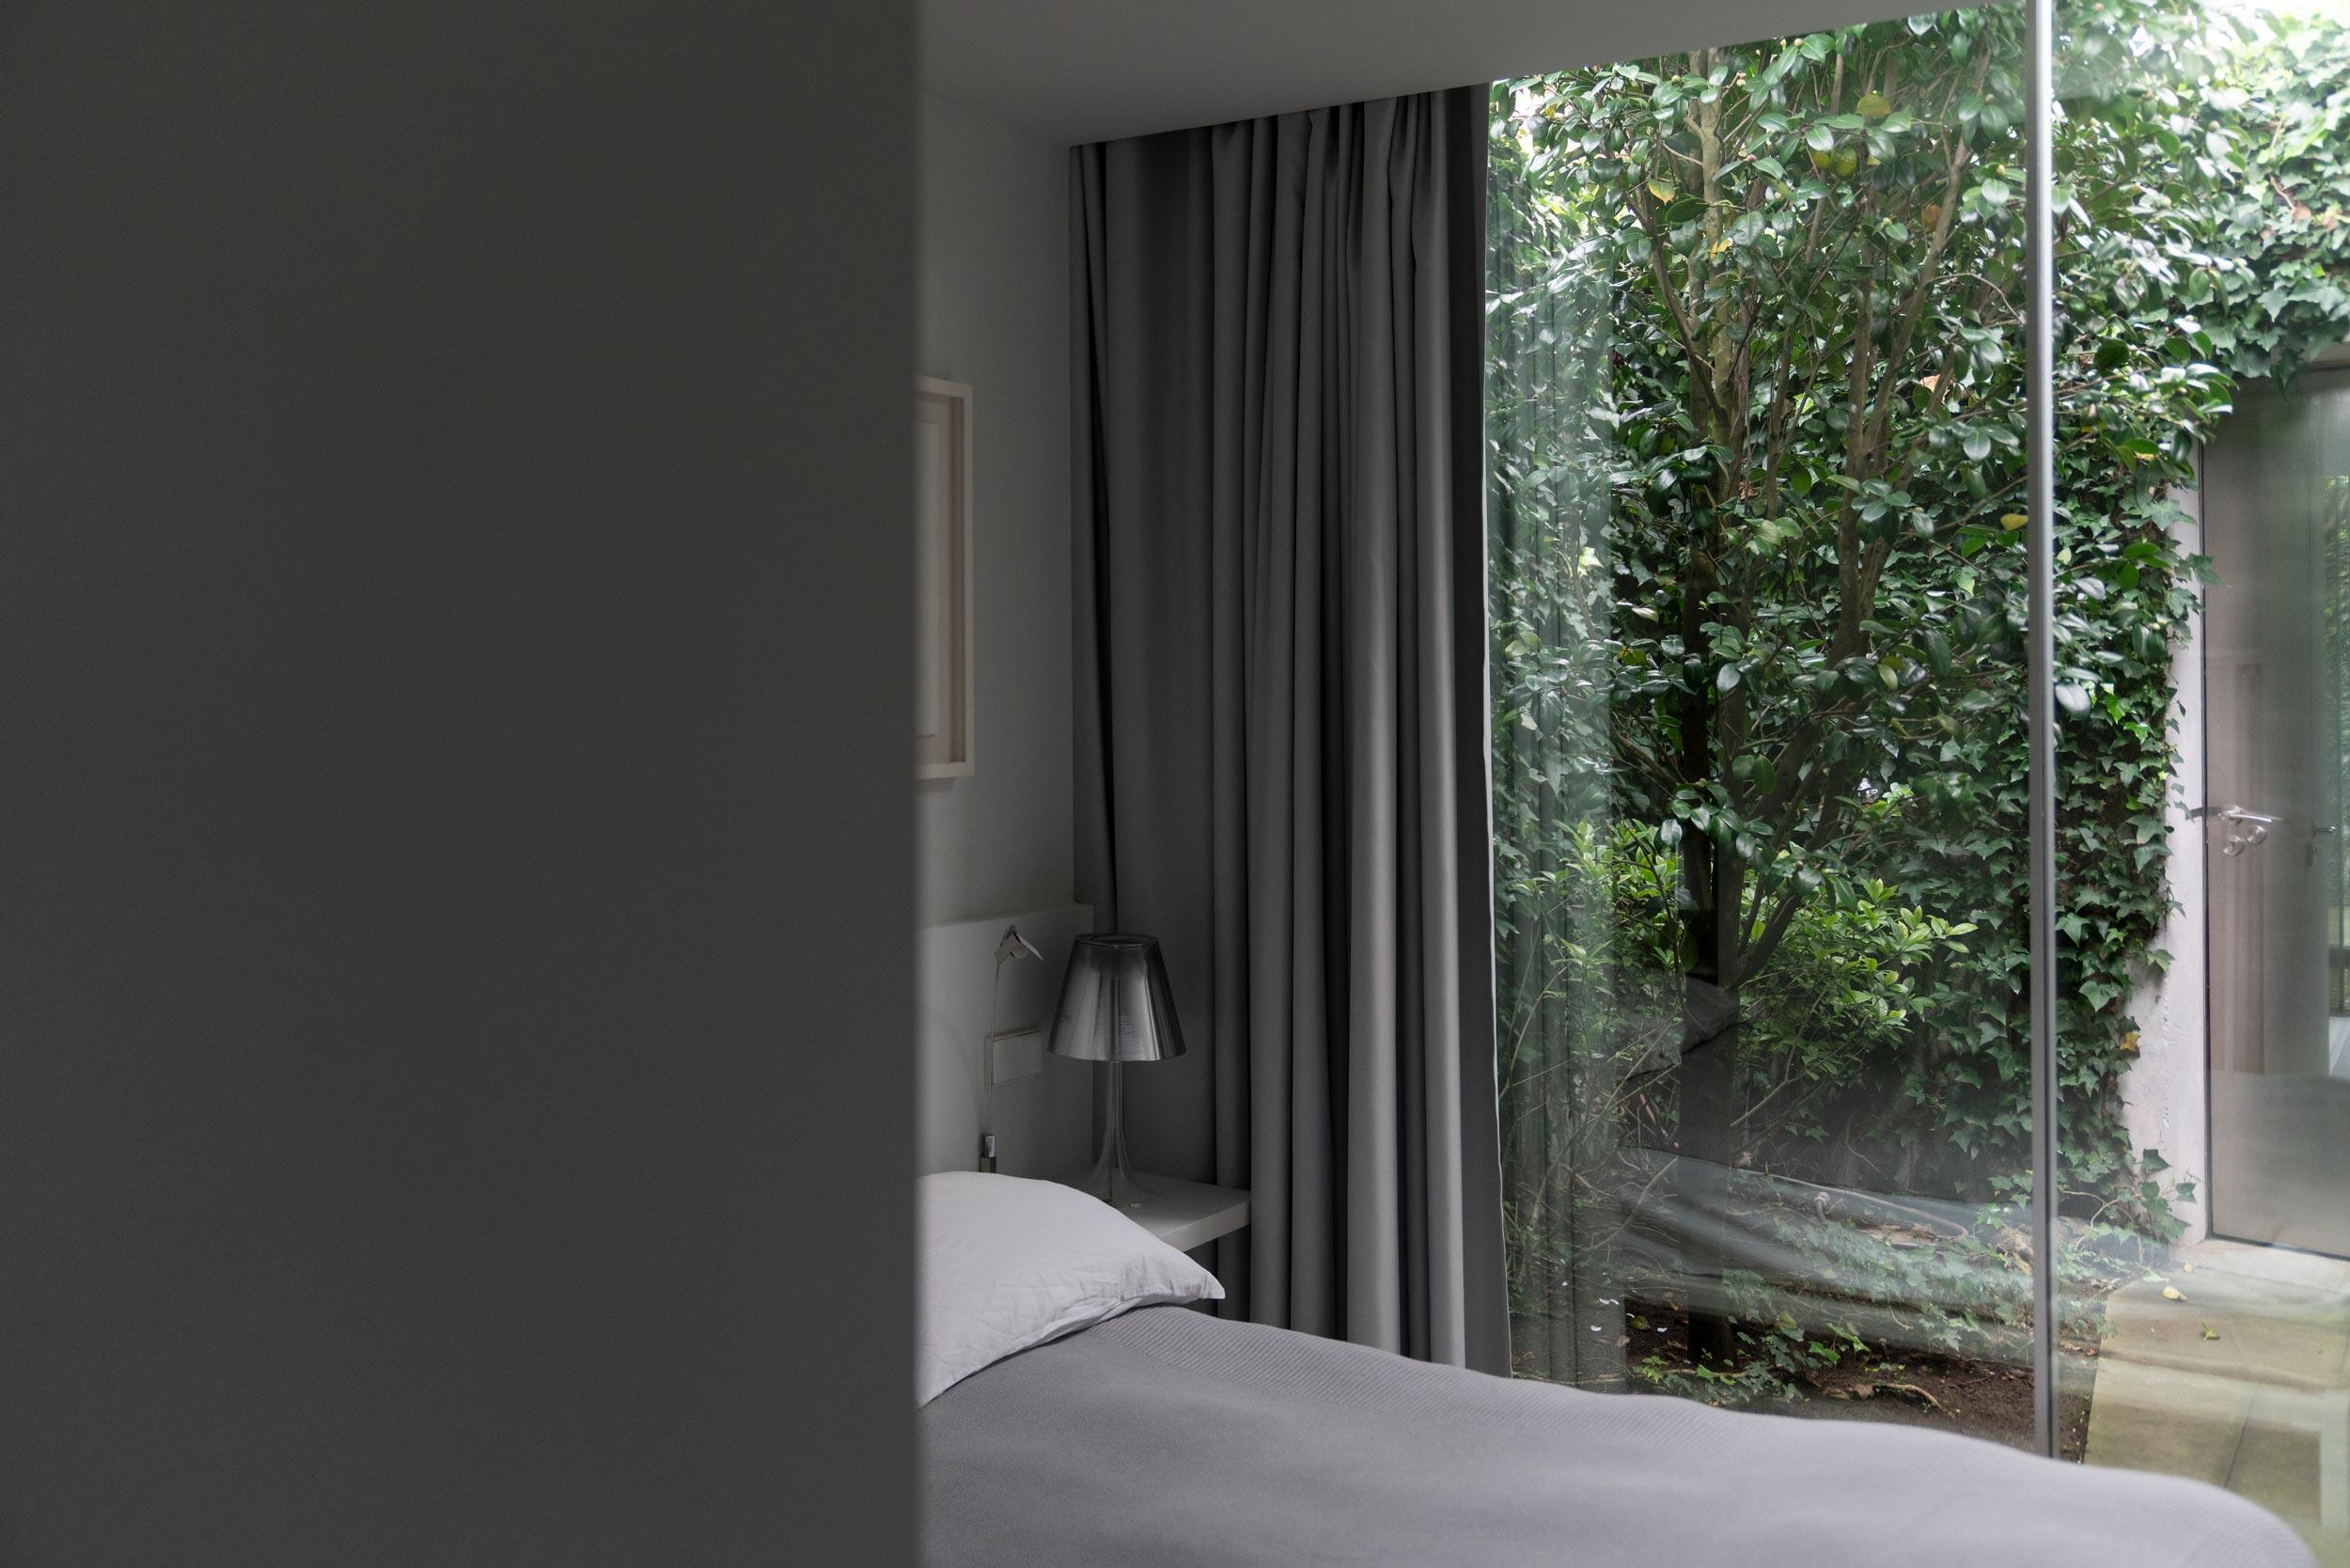 Fiona-Burrage-casa-1015-porto-norwich-photographer-bedroom.jpg